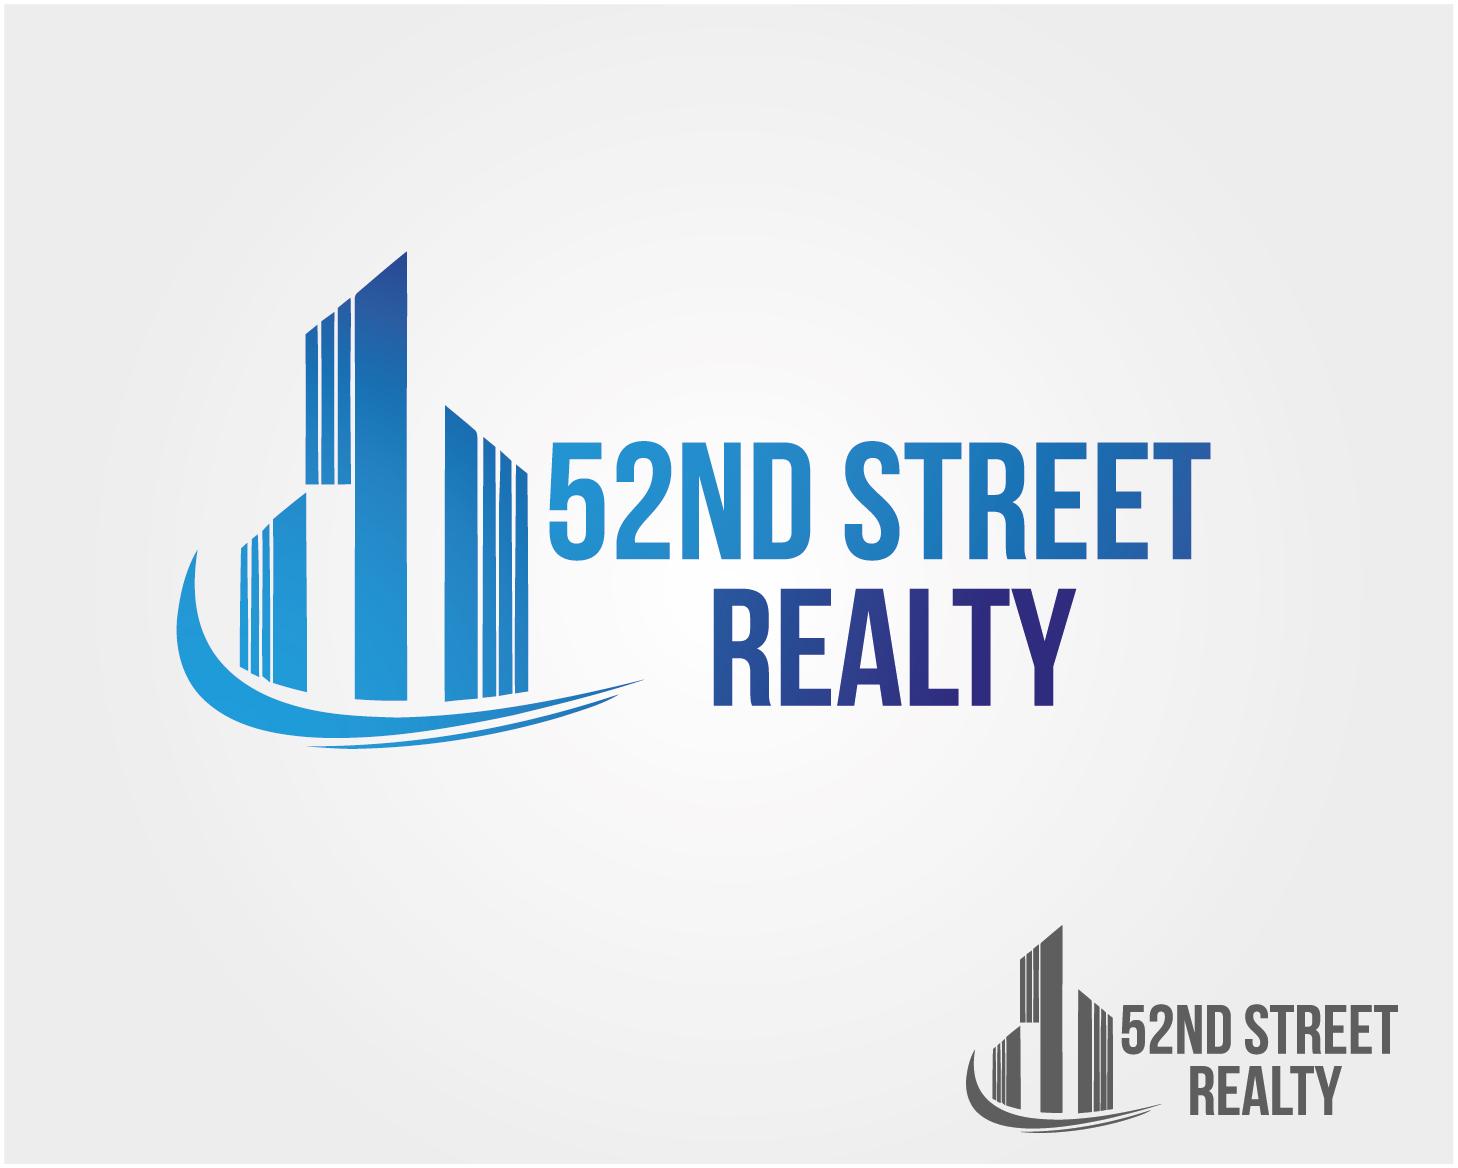 Logo Design by VENTSISLAV KOVACHEV - Entry No. 35 in the Logo Design Contest 52nd Street Realty Logo Design.